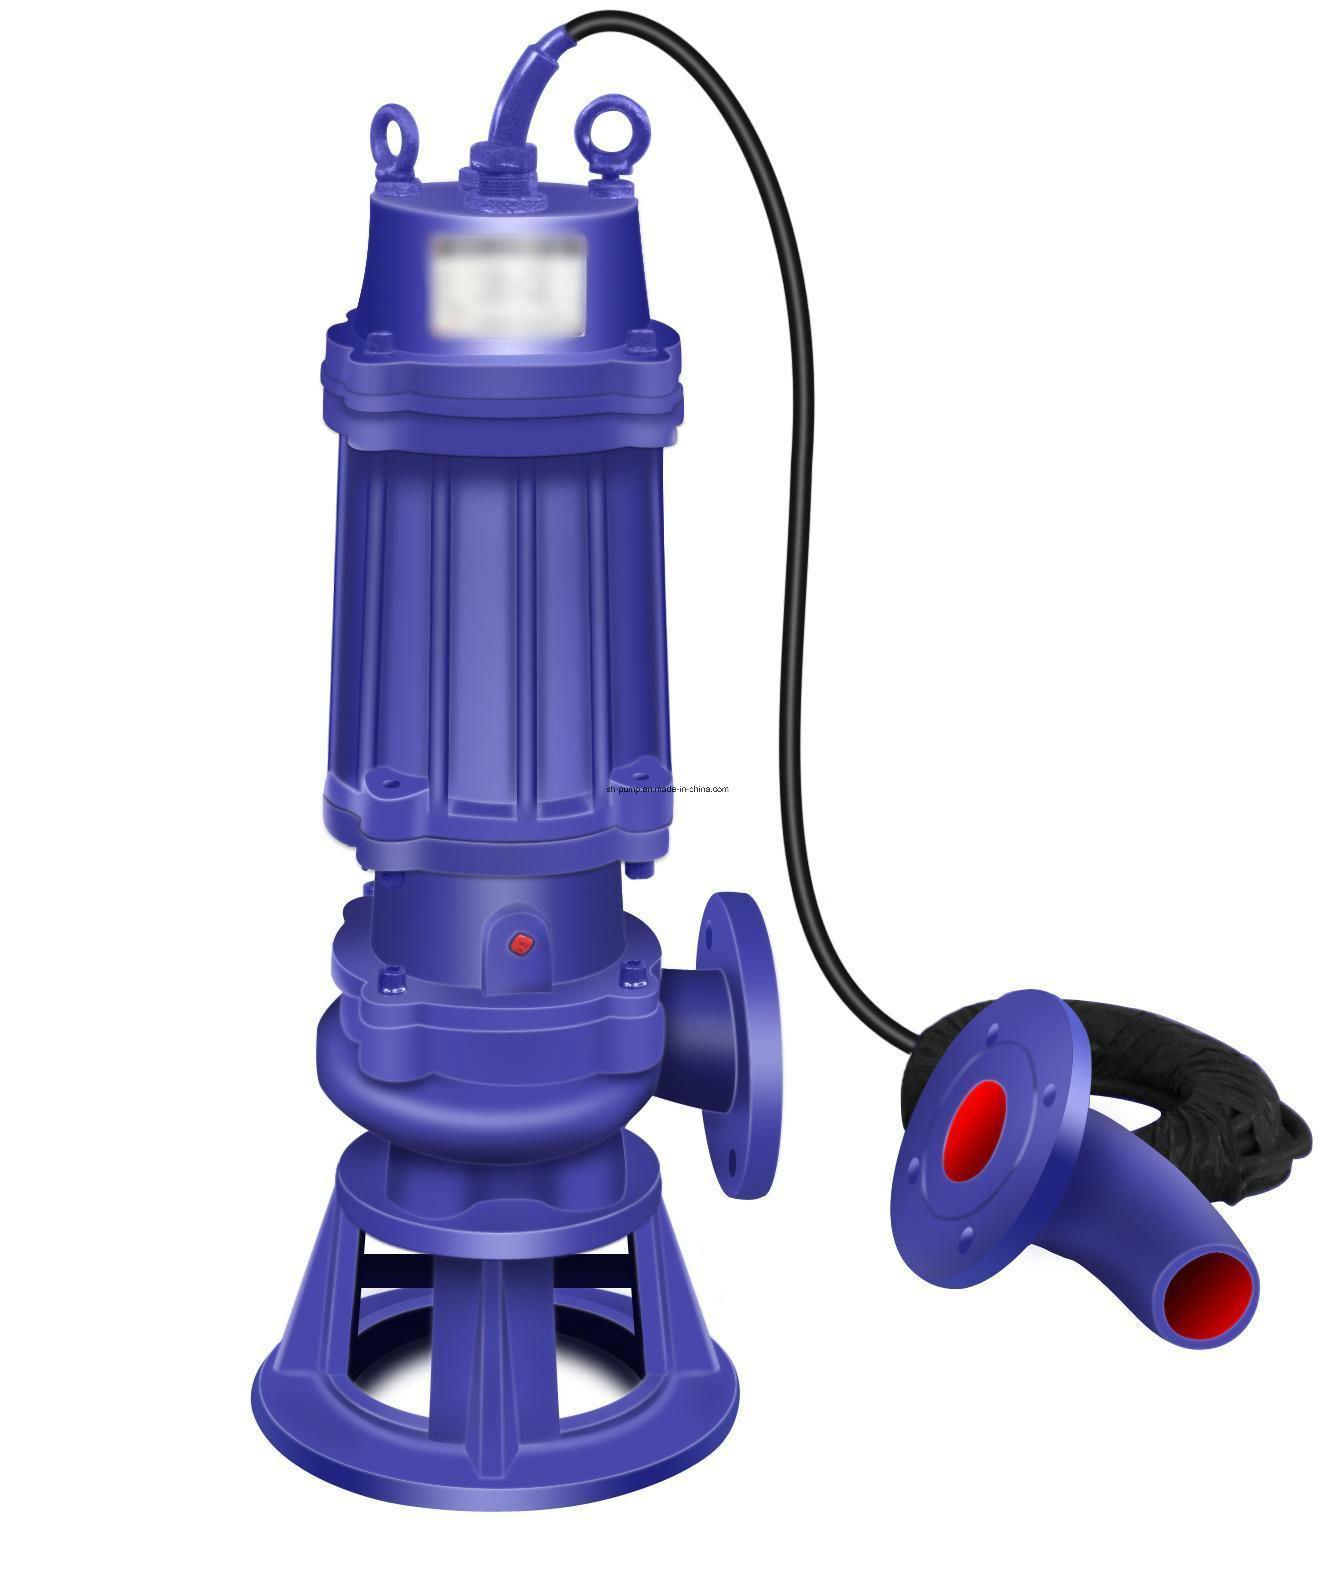 Mf Mn Series Sewage Pump